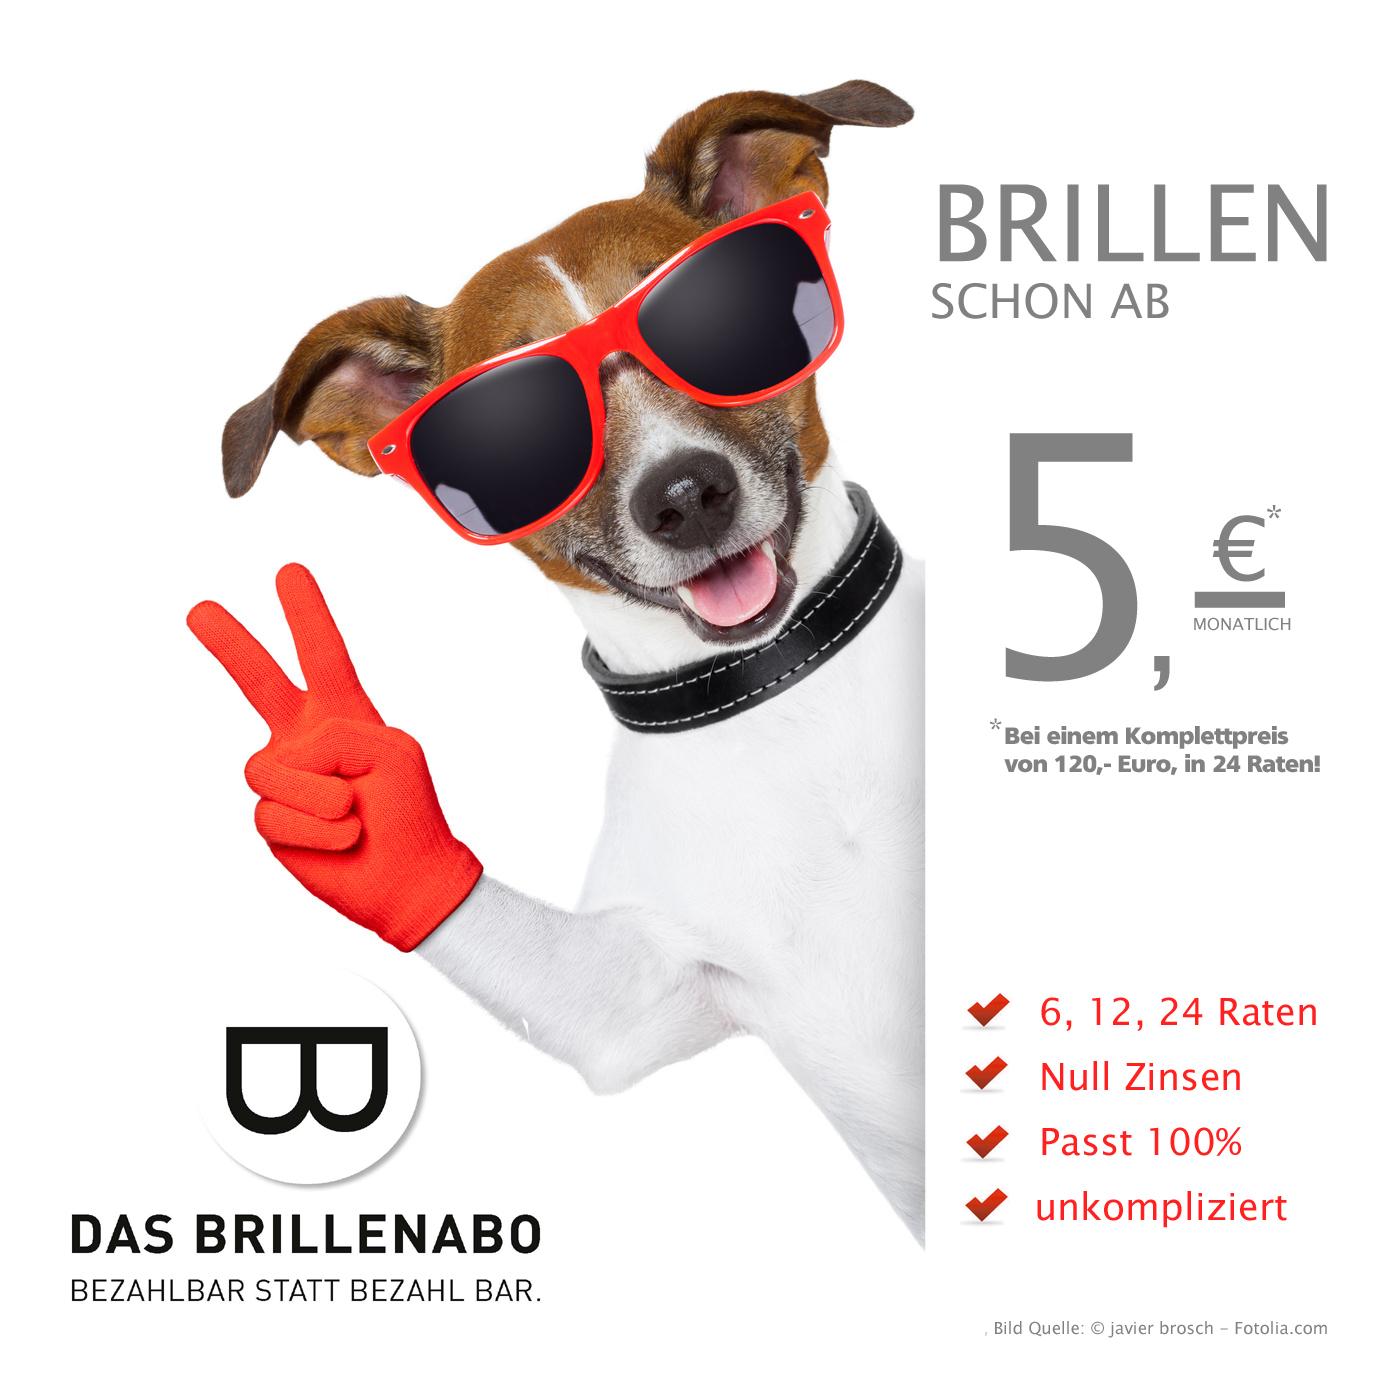 überlegene Materialien Farbbrillanz berühmte Designermarke Ratenzahlung - Optik-Sander Halle